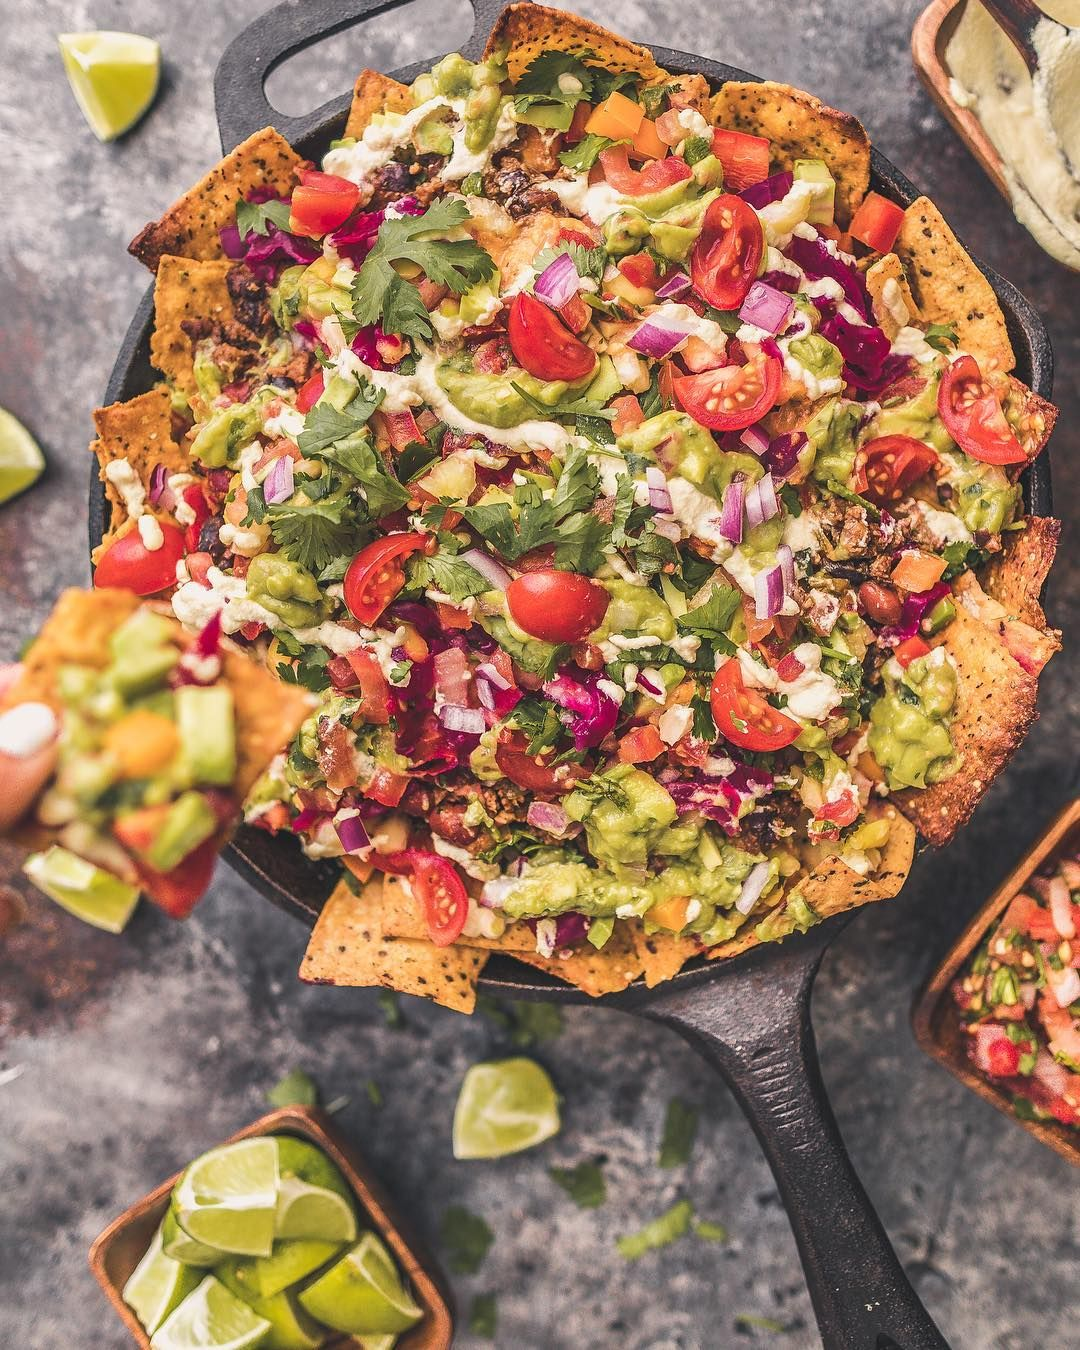 Pin By Anna Hagberg On Healthy Food Vegan Recipes Nachos